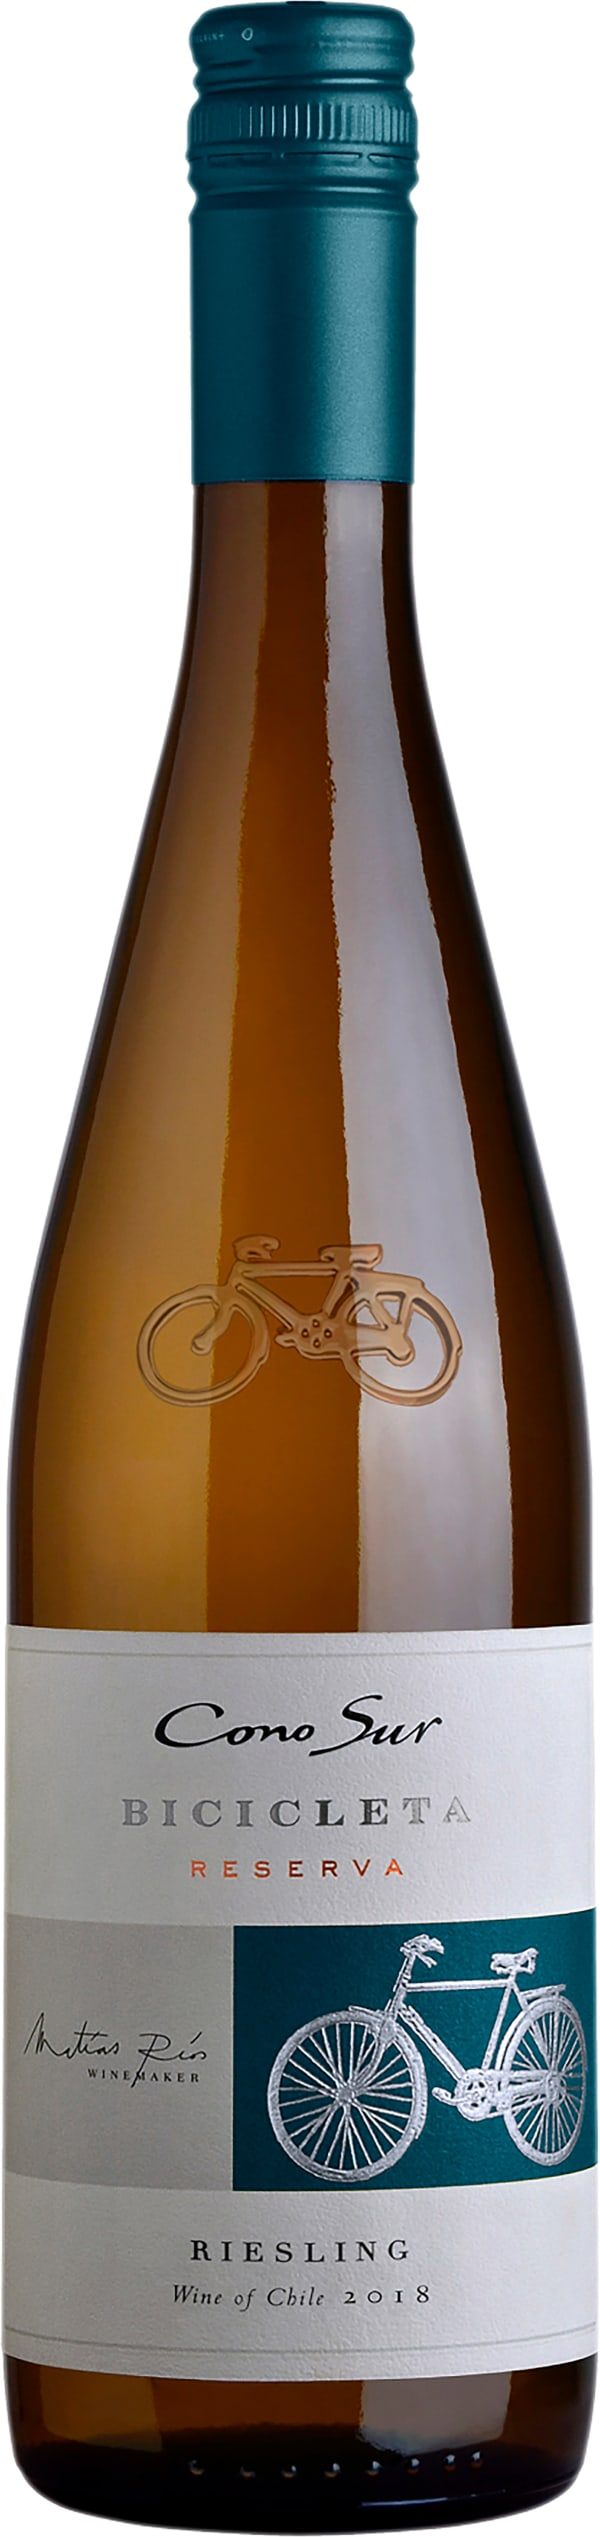 Cono Sur Bicicleta Riesling 2018